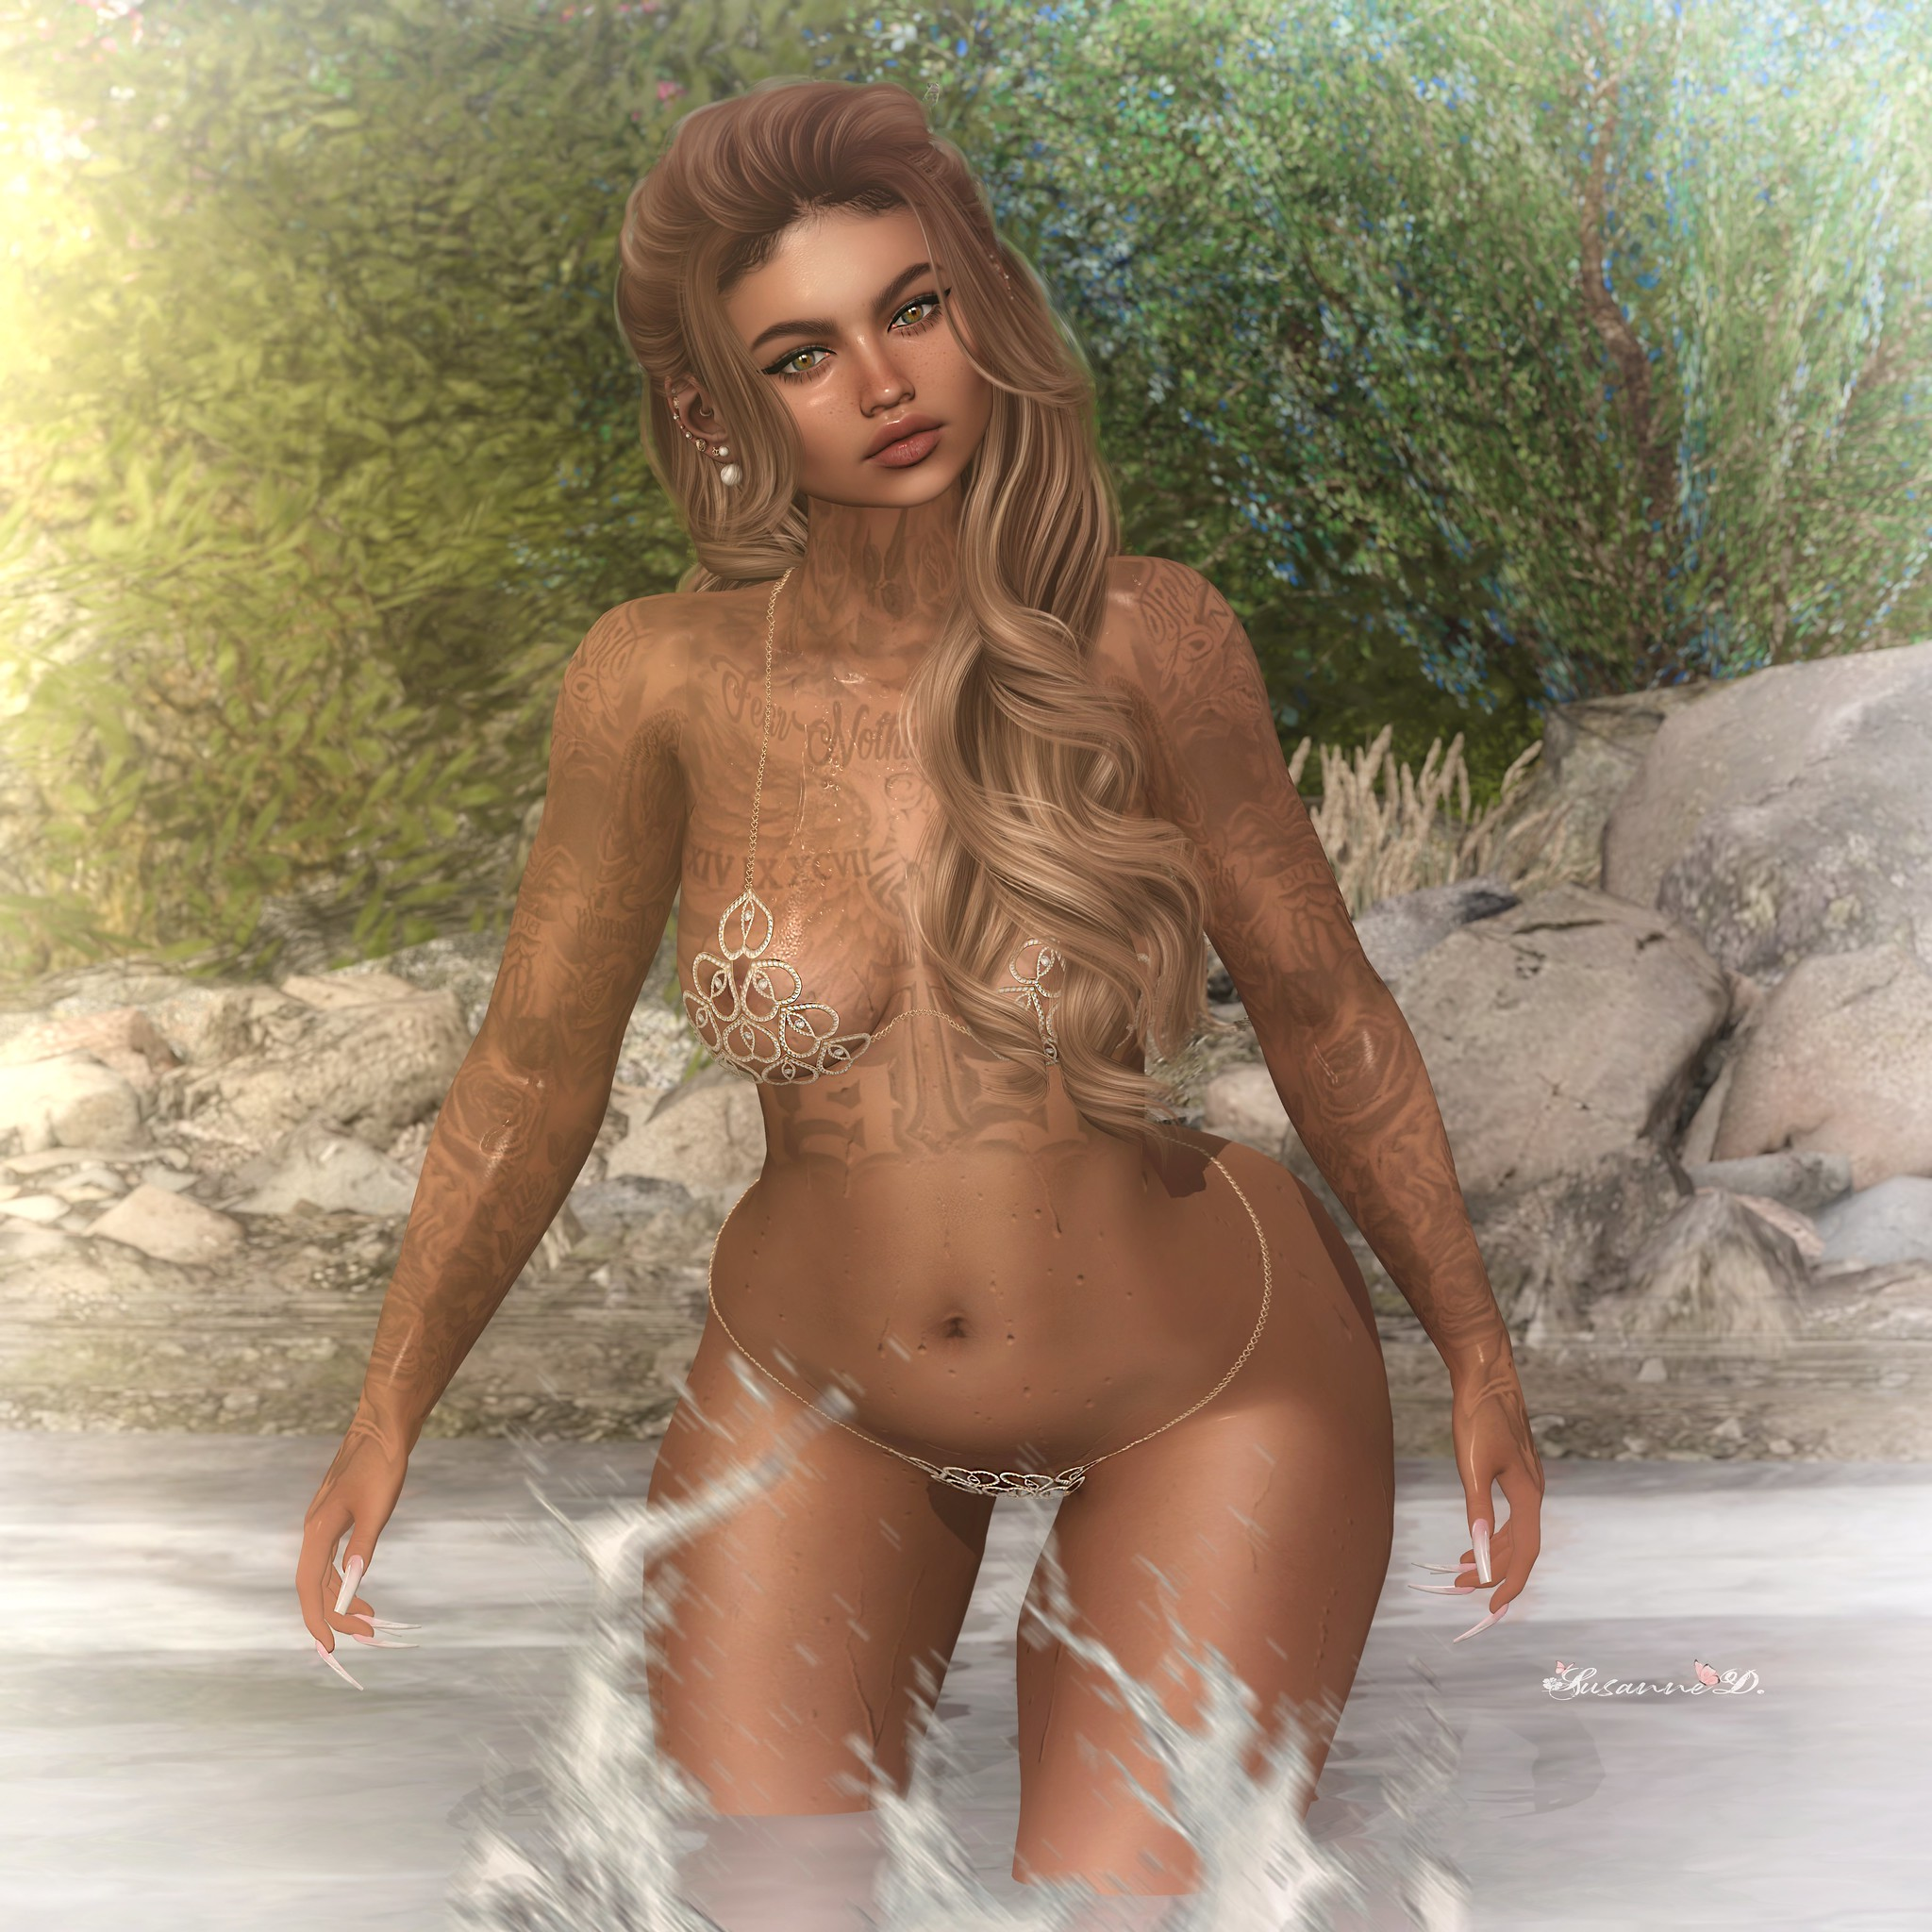 Mermaid?